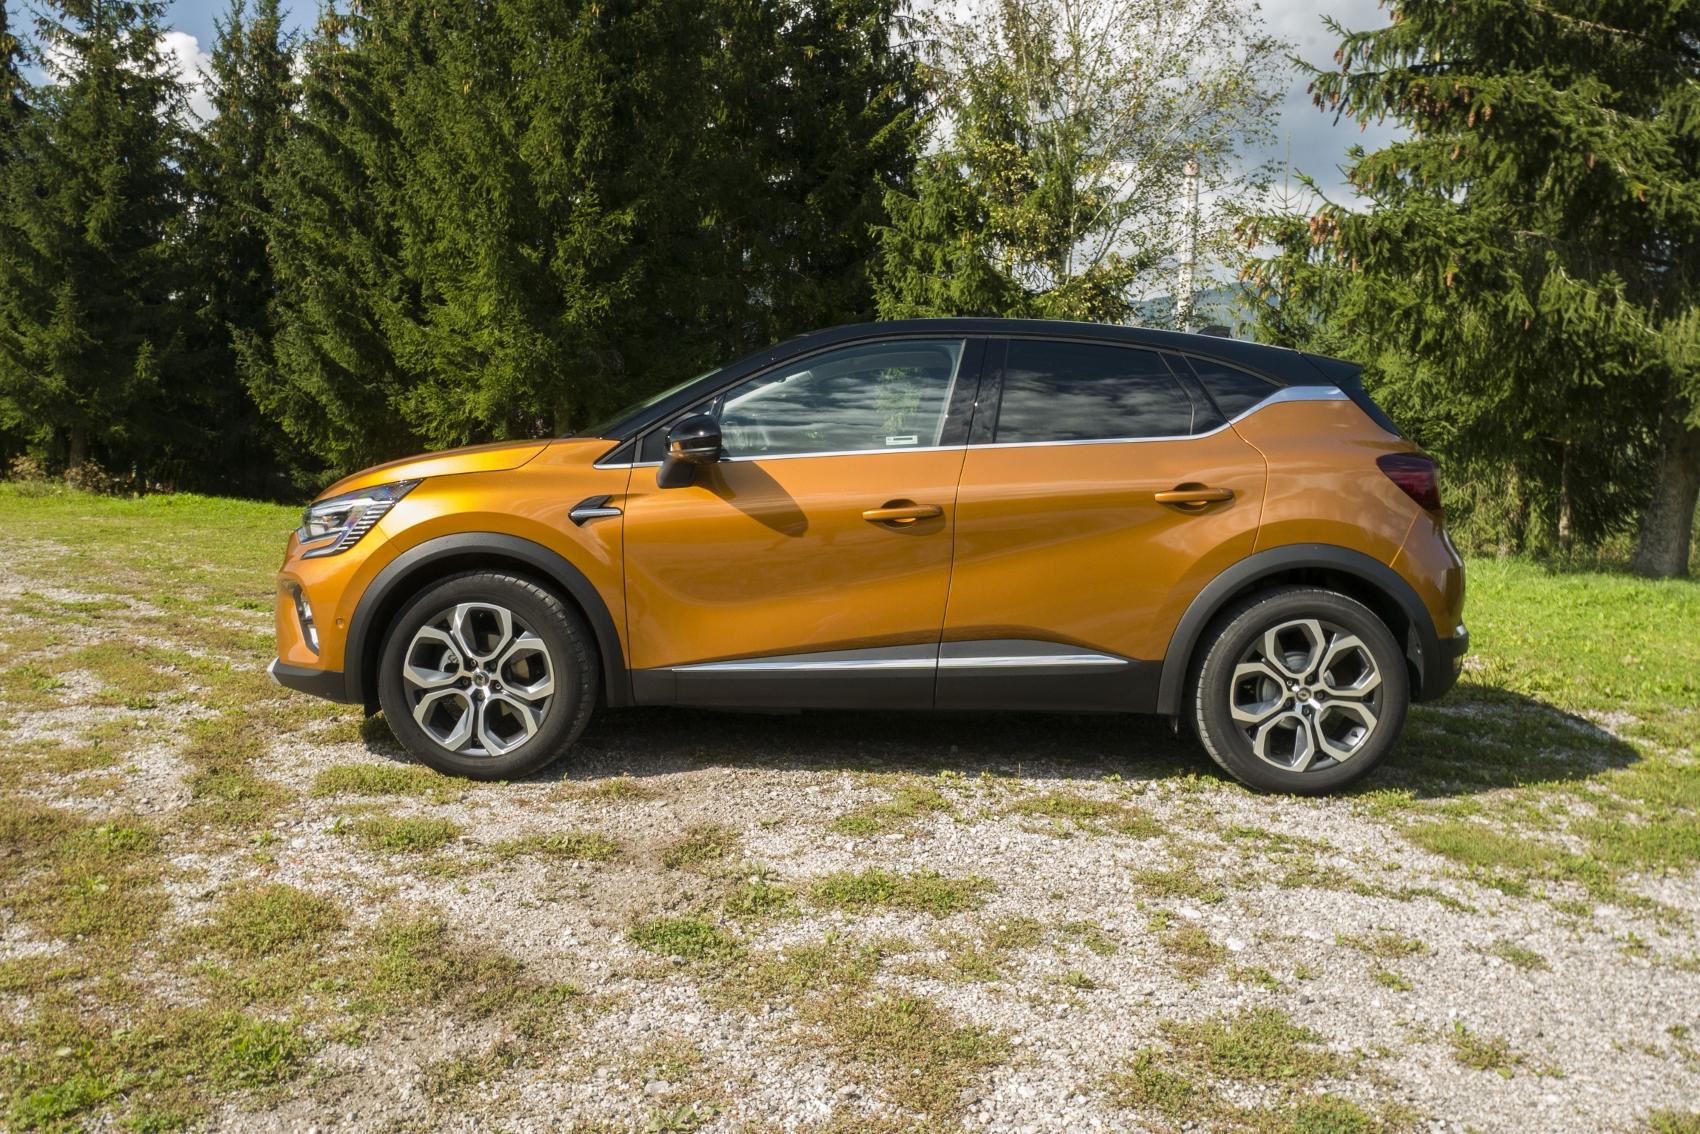 Test: V interiéri sa Renault Captur tvári ako o triedu drahšie auto tSXhUEJ0Jo renault-captur-7